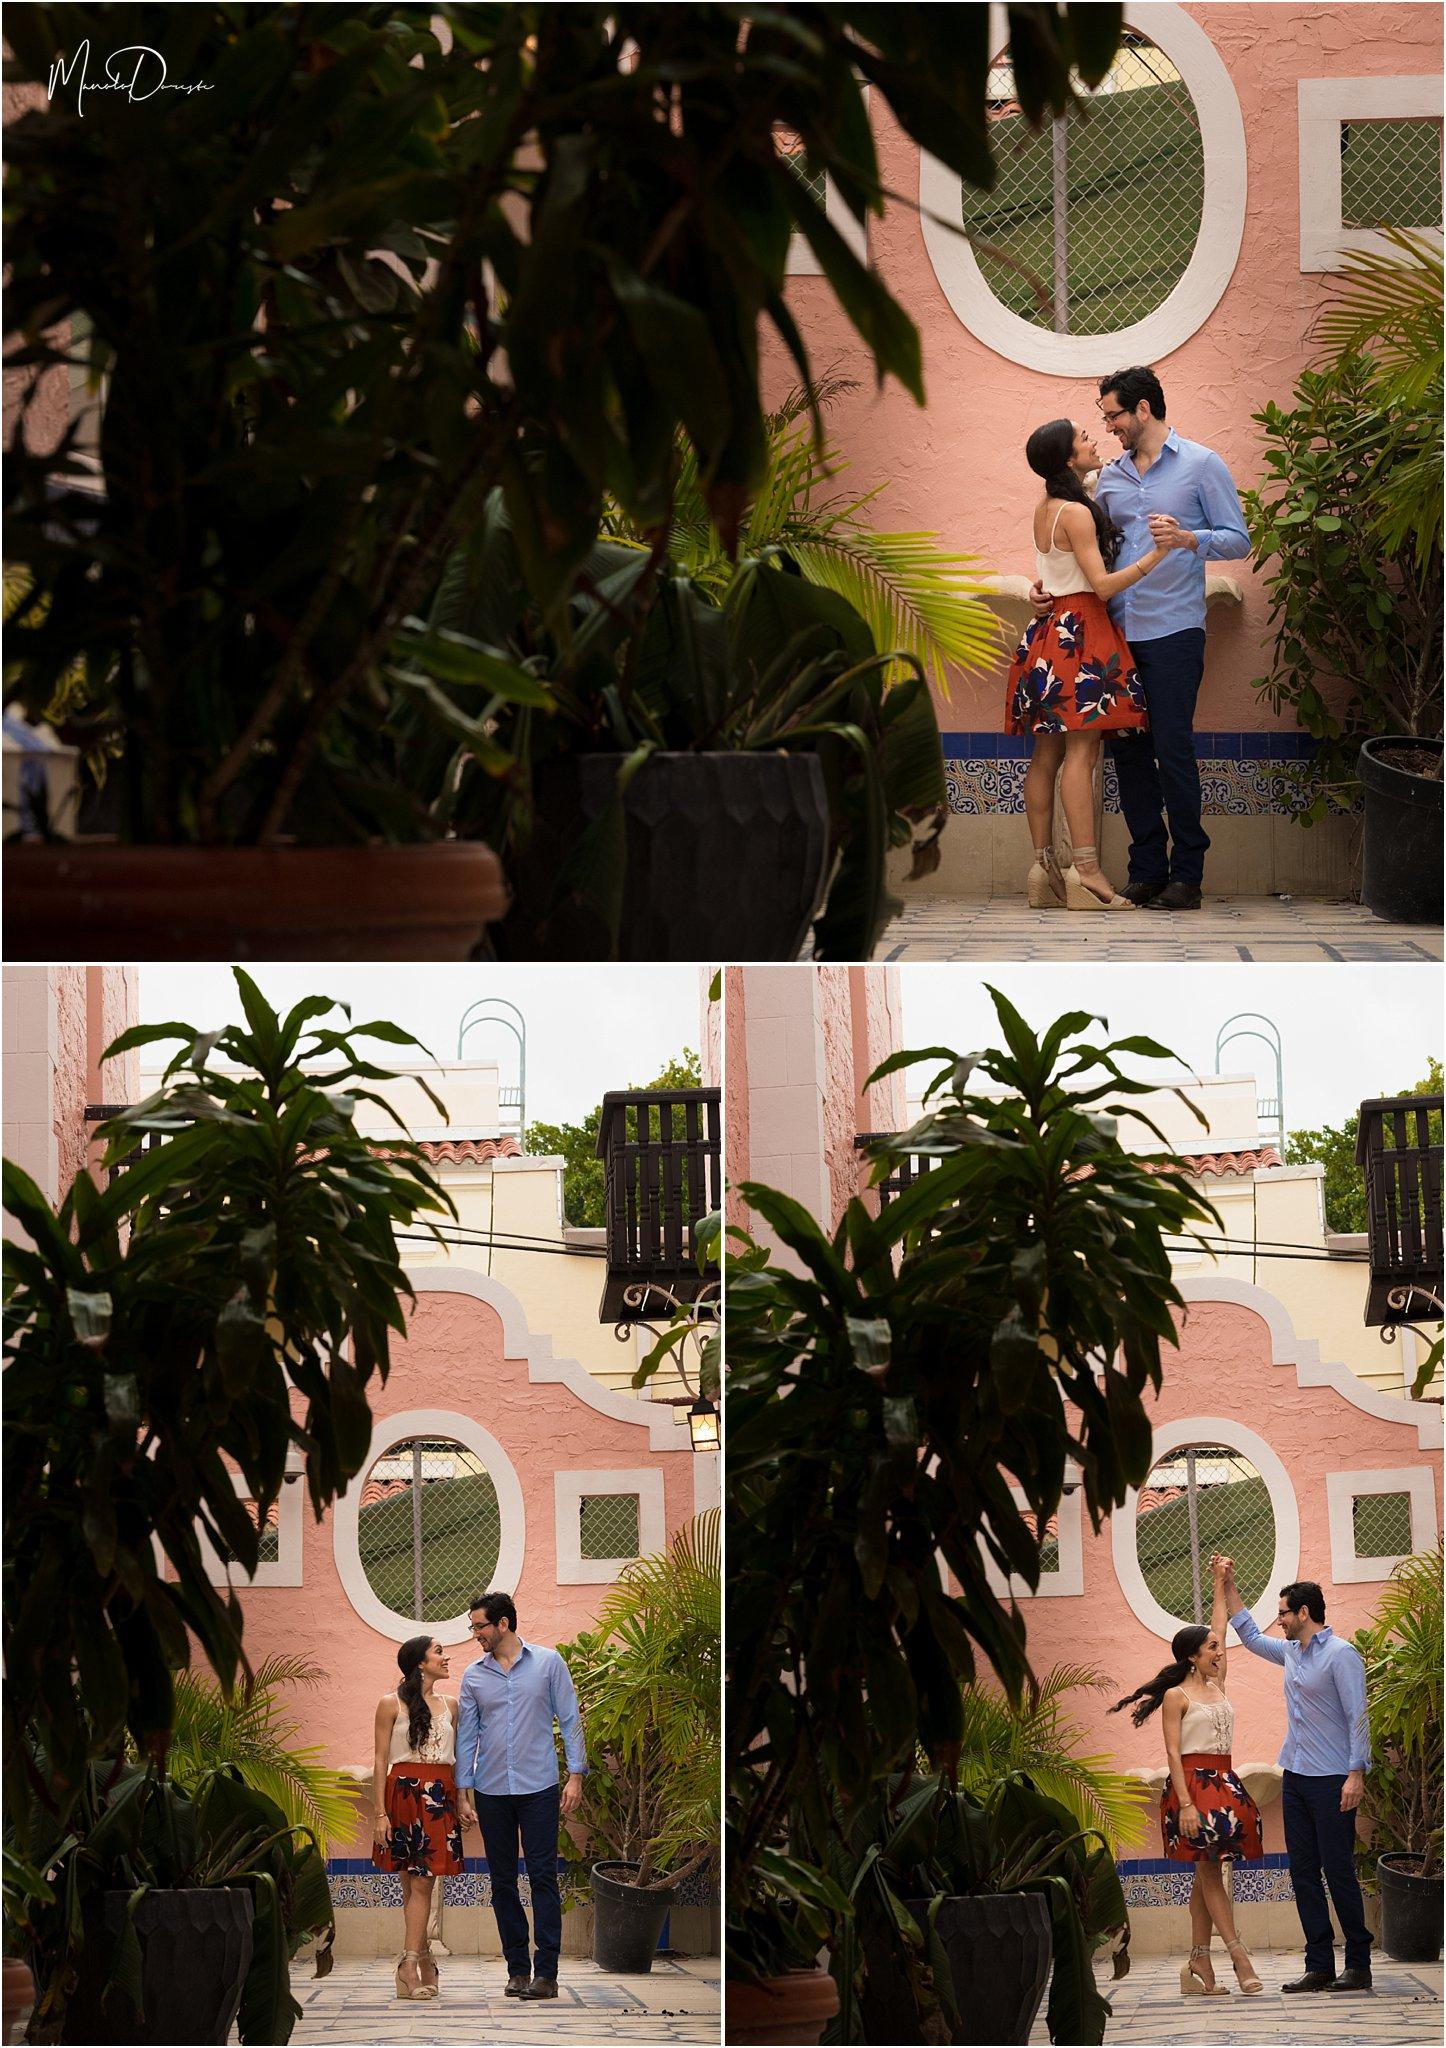 00774_ManoloDoreste_InFocusStudios_Wedding_Family_Photography_Miami_MiamiPhotographer.jpg